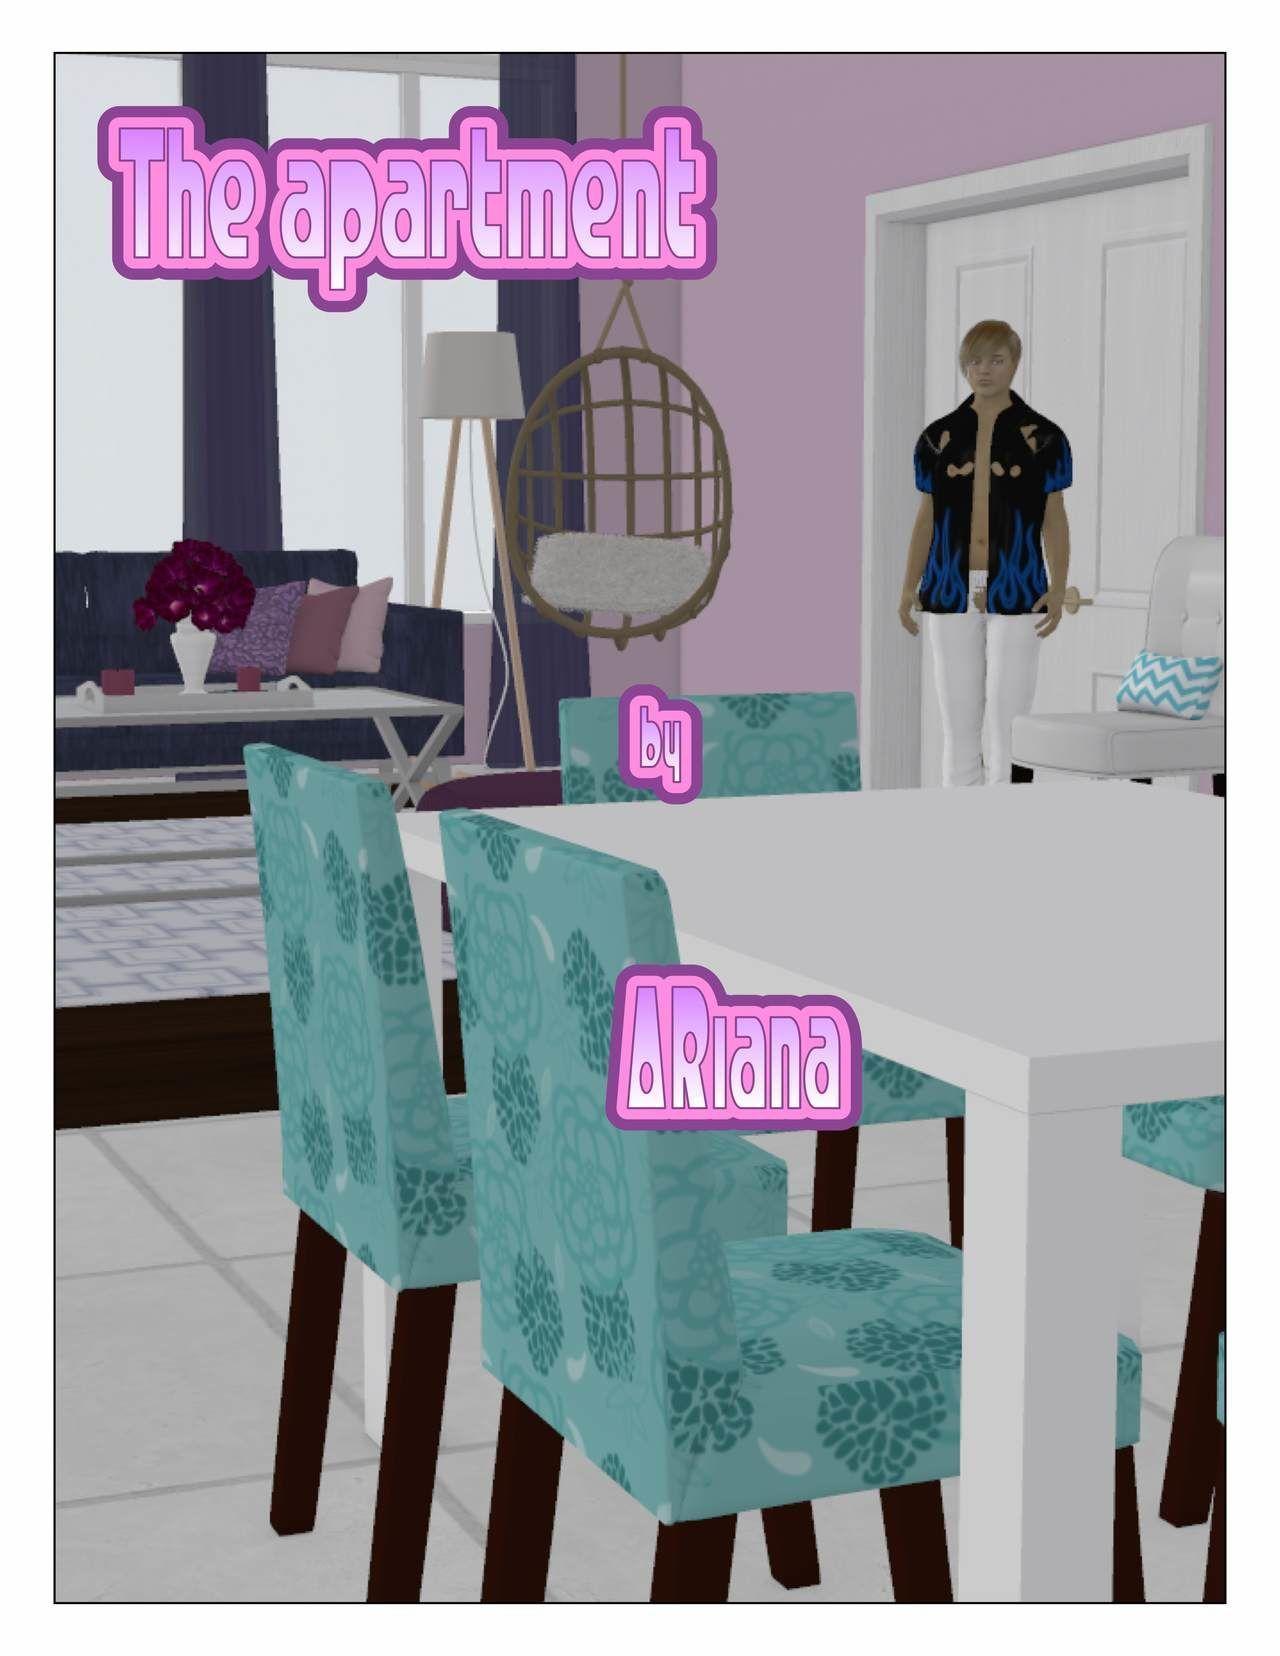 [Ariana] The Apartment